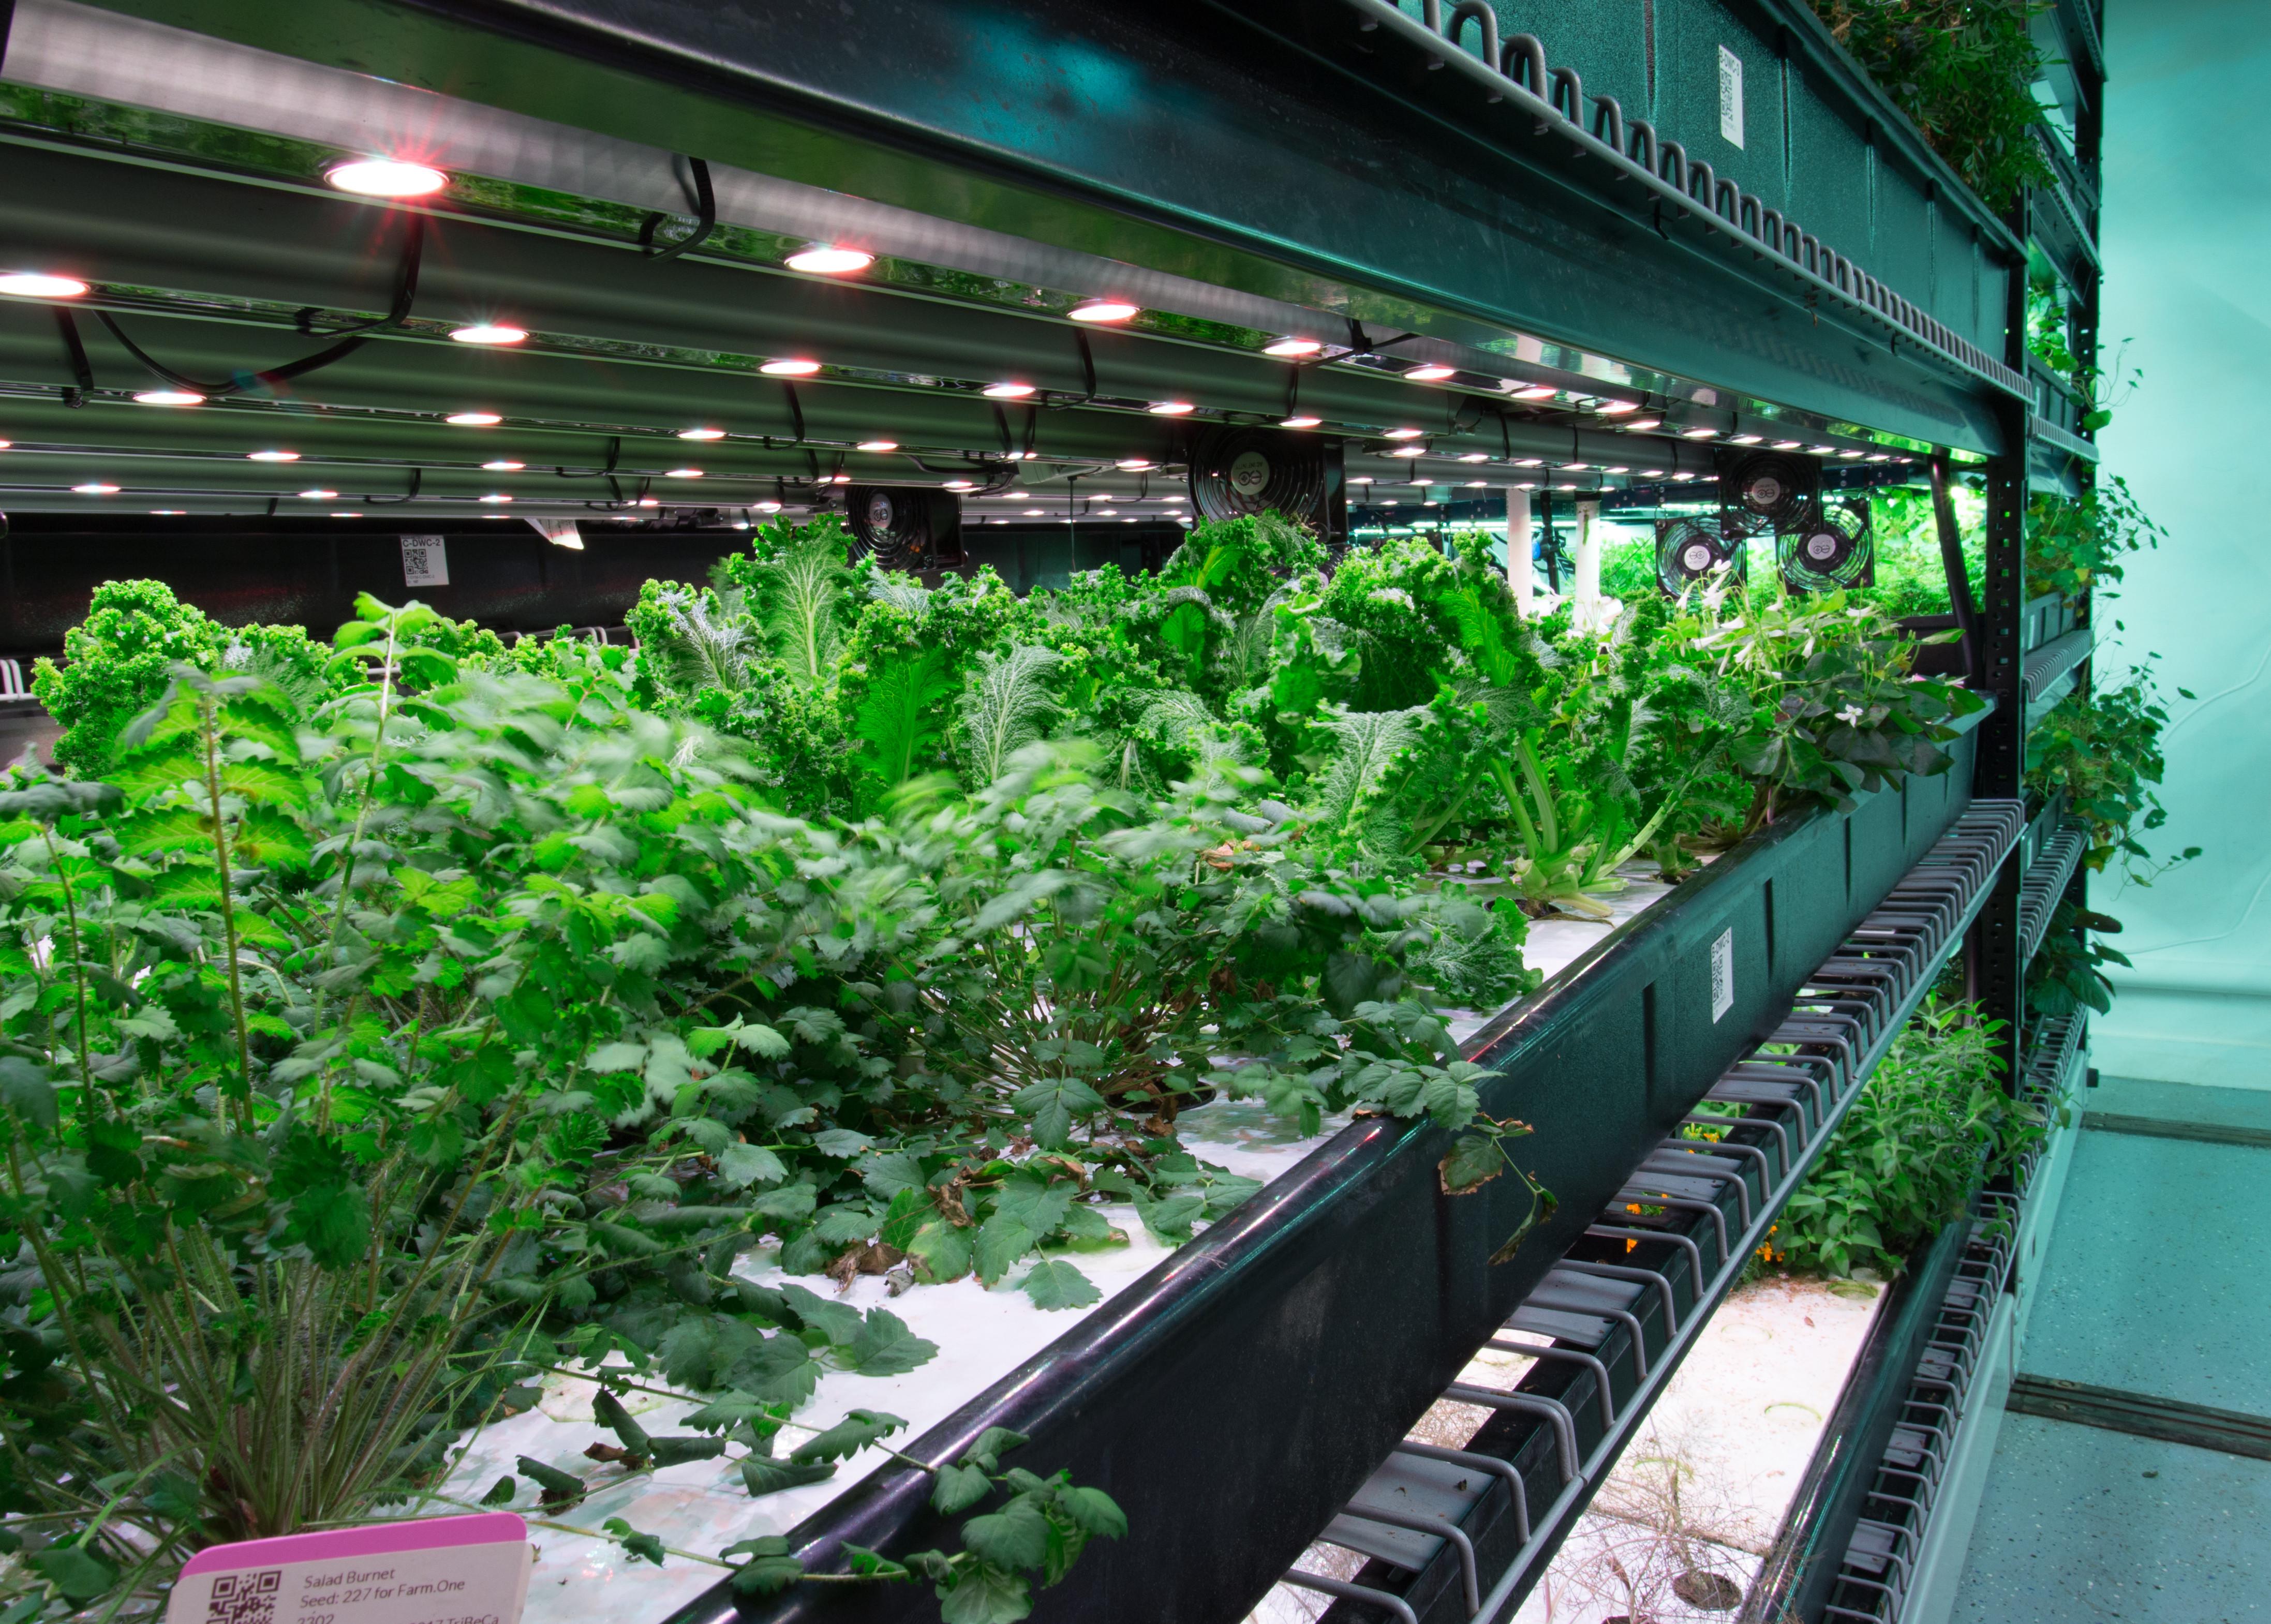 Hydroponic Grow Facility